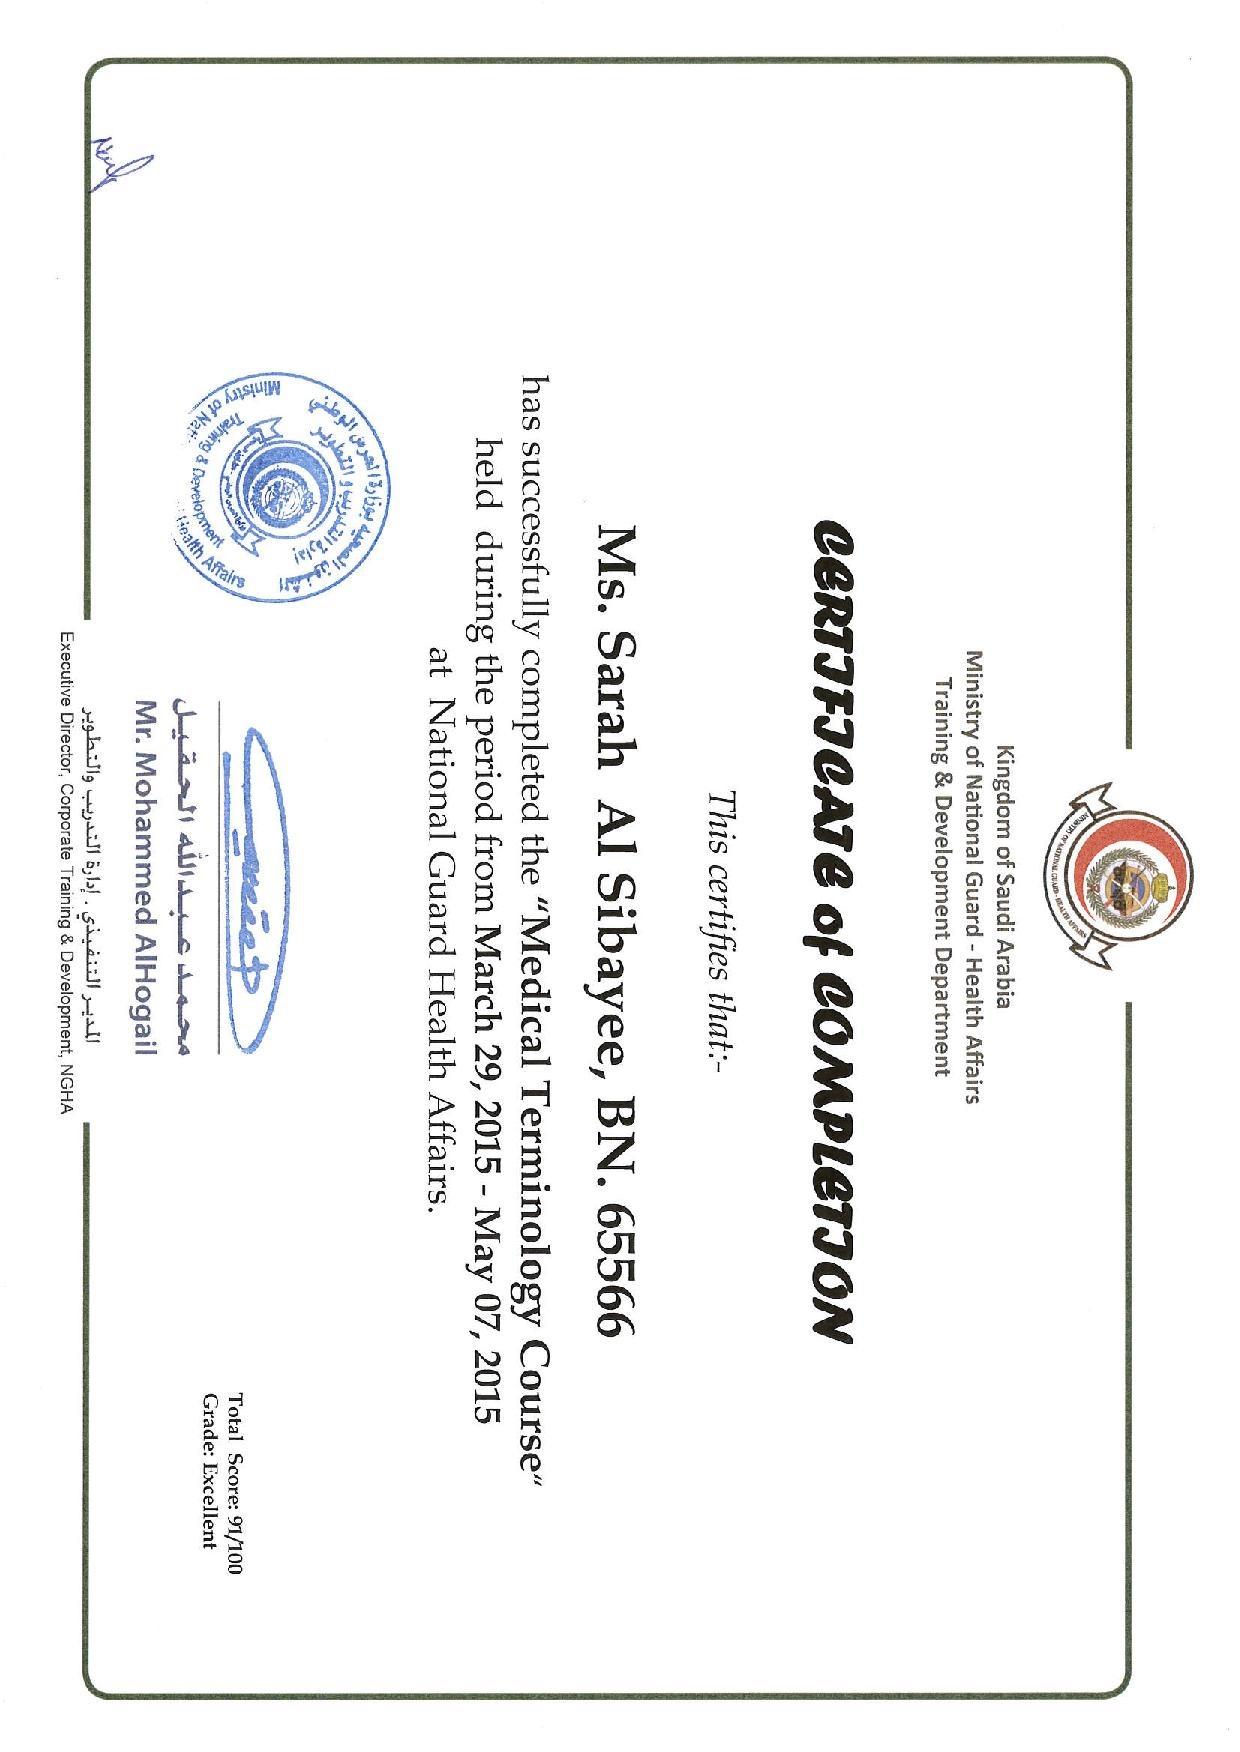 Sara salem bayt medical terminology course cambridge certificate 1betcityfo Choice Image